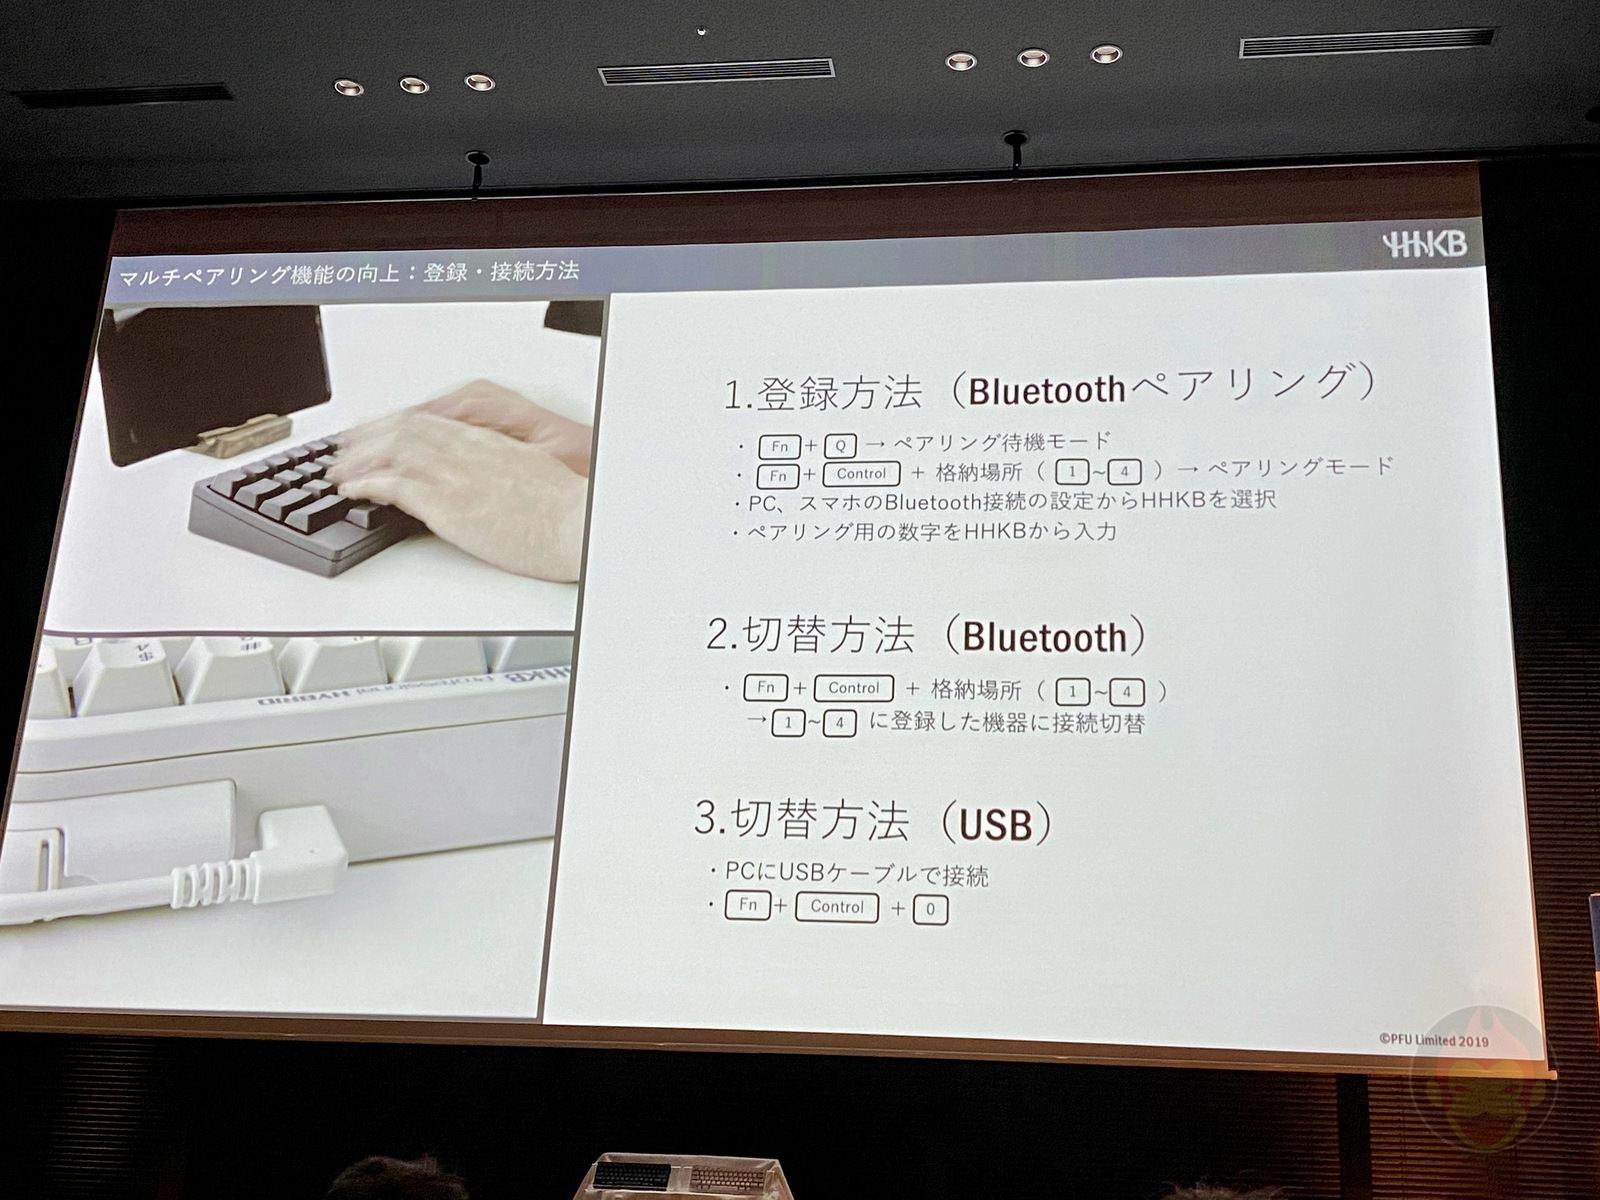 Happy-Hacking-Keyboard-New-Model-Presentation-05.jpeg